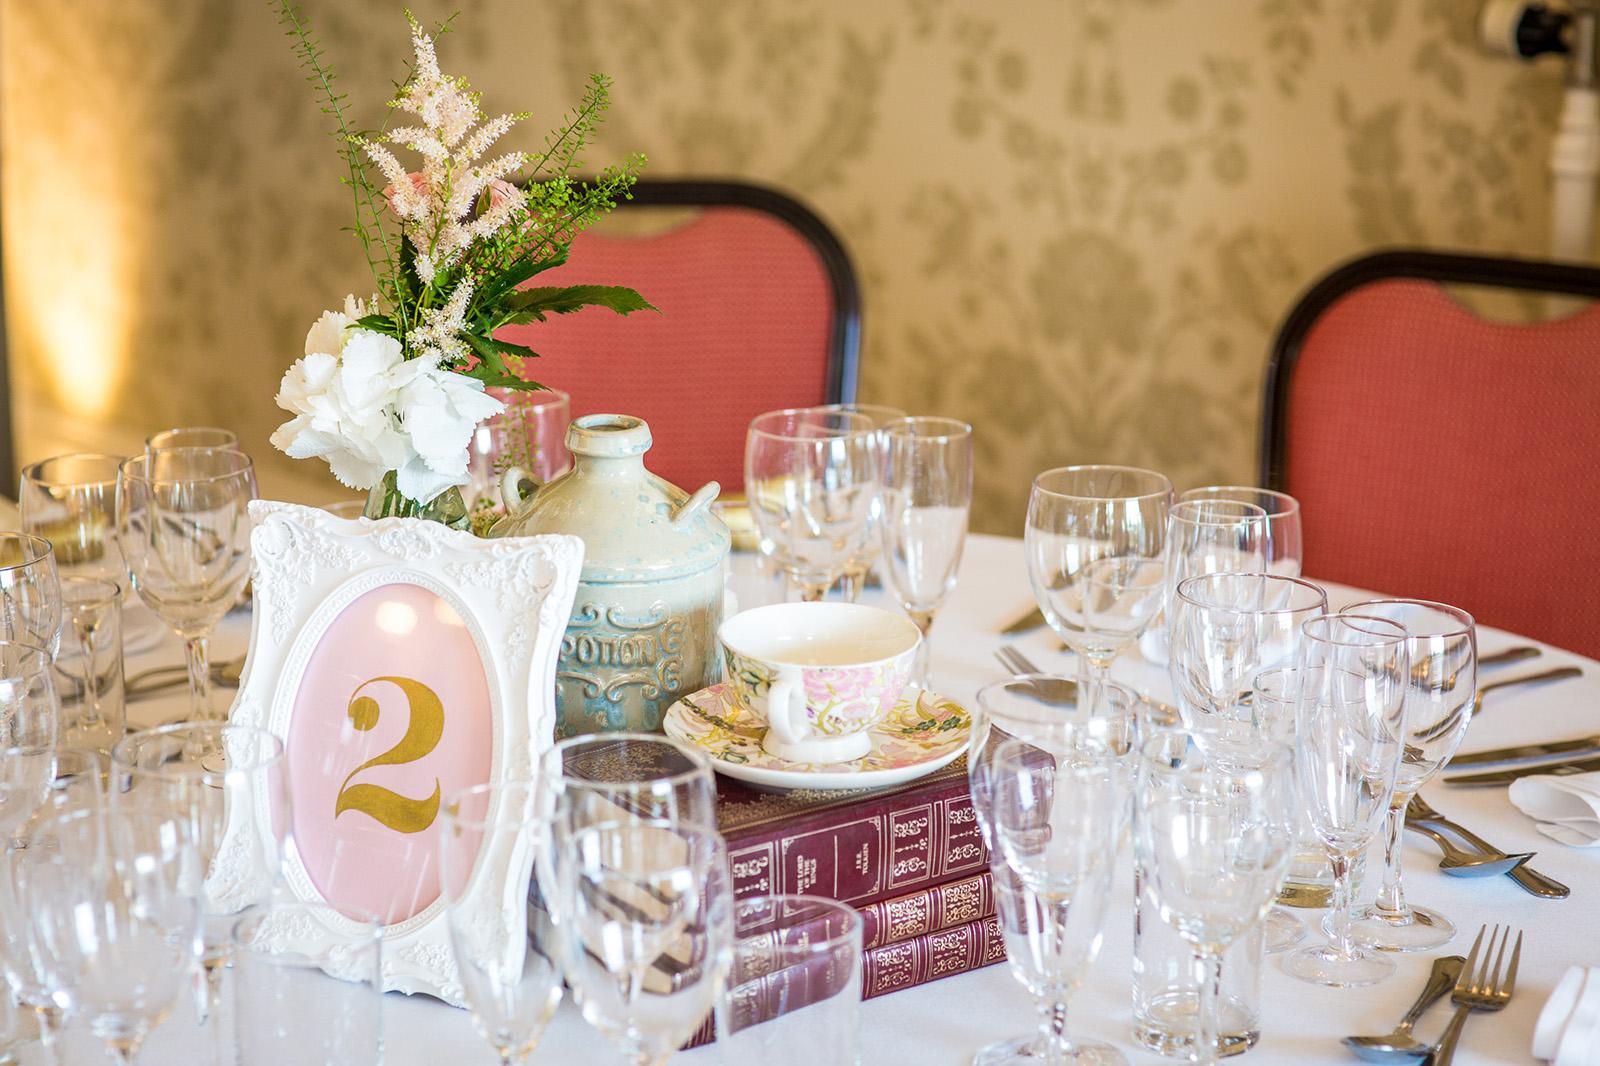 Origami Wedding Centerpieces 8785634 Airhumidifierfo